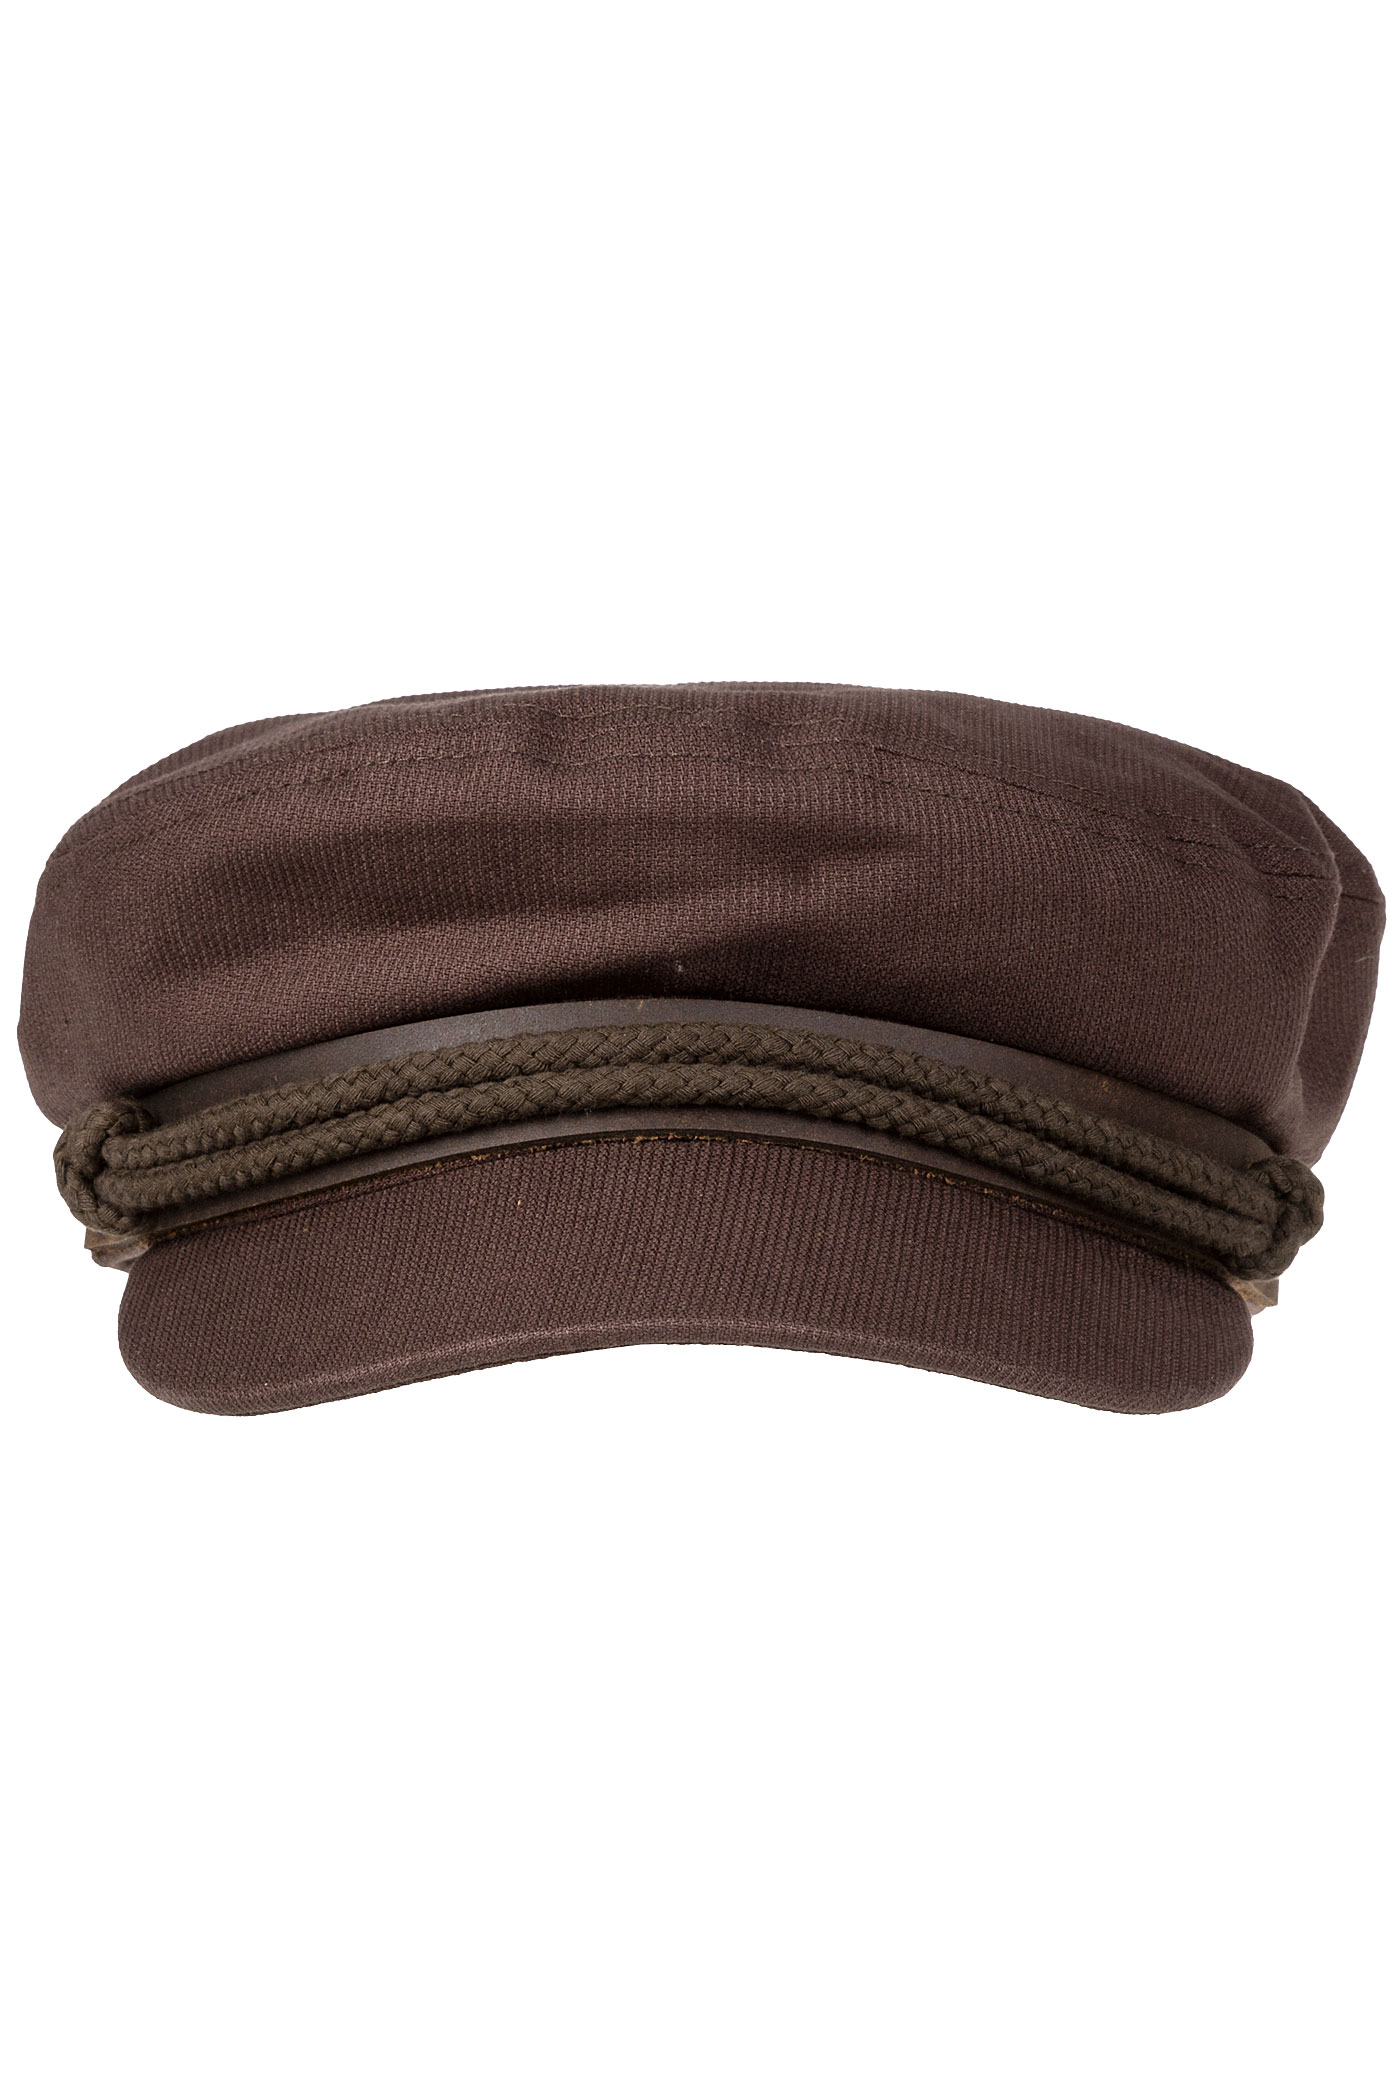 29e3595ba2a Brixton Fiddler Hat (brown cord) buy at skatedeluxe